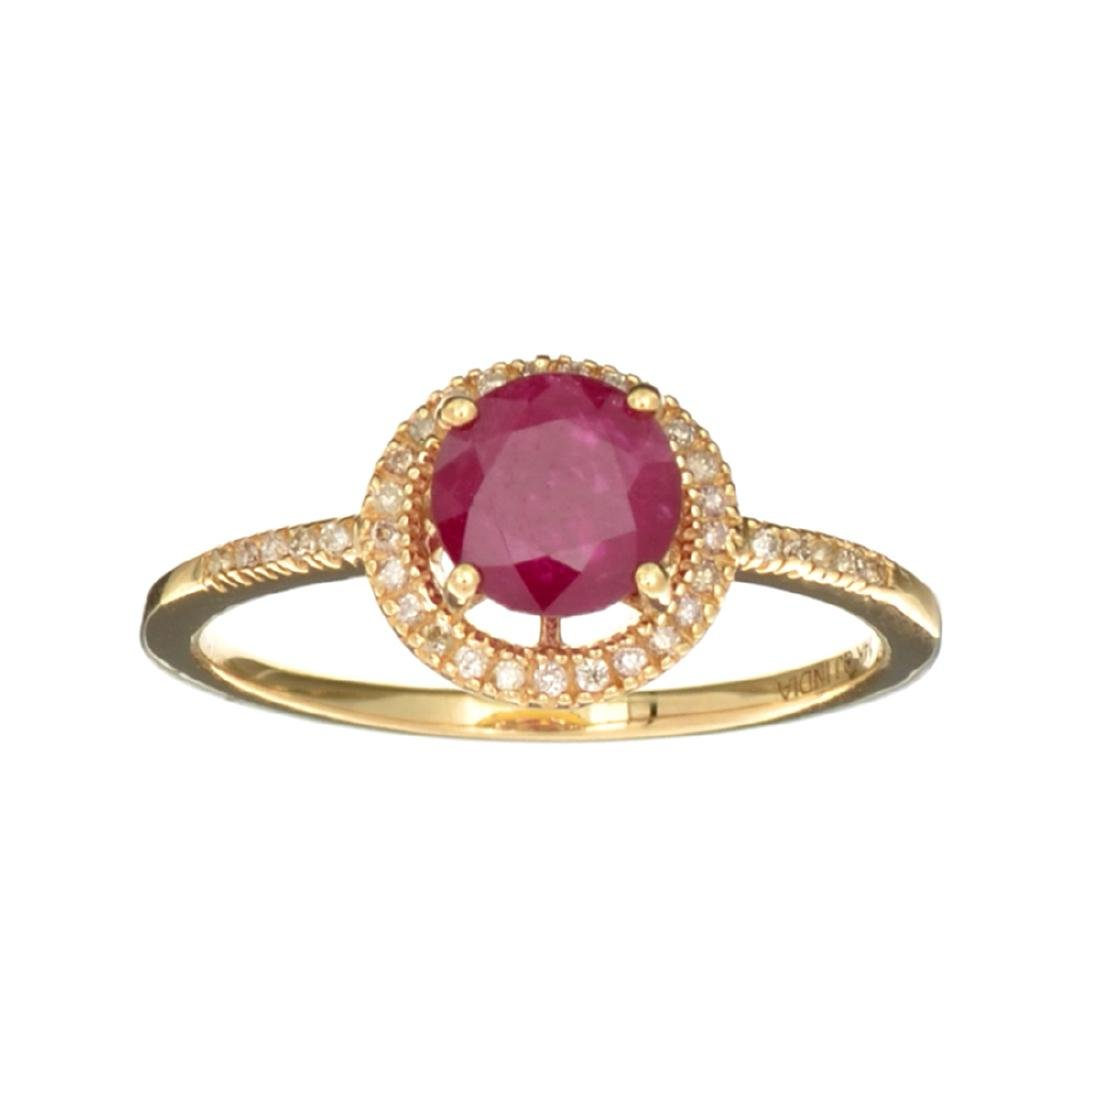 Designer Sebastian 14 KT Gold, 1.25CT Round Cut Ruby